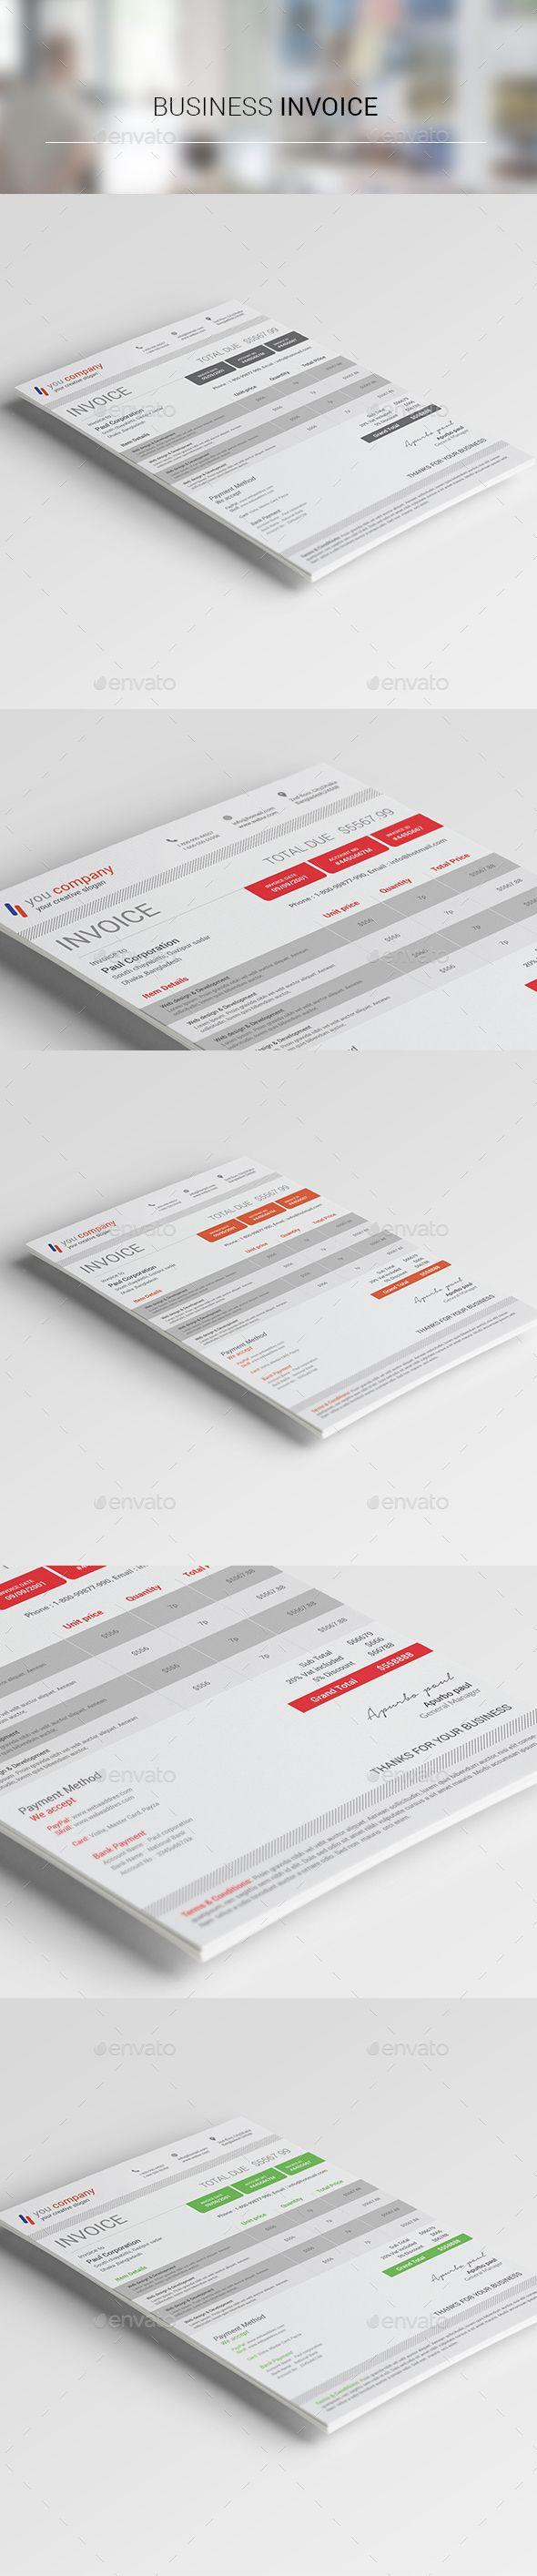 Corporate Business Invoice Template PSD #design Download: http://graphicriver.net/item/corporate-business-invoice02/14310021?ref=ksioks